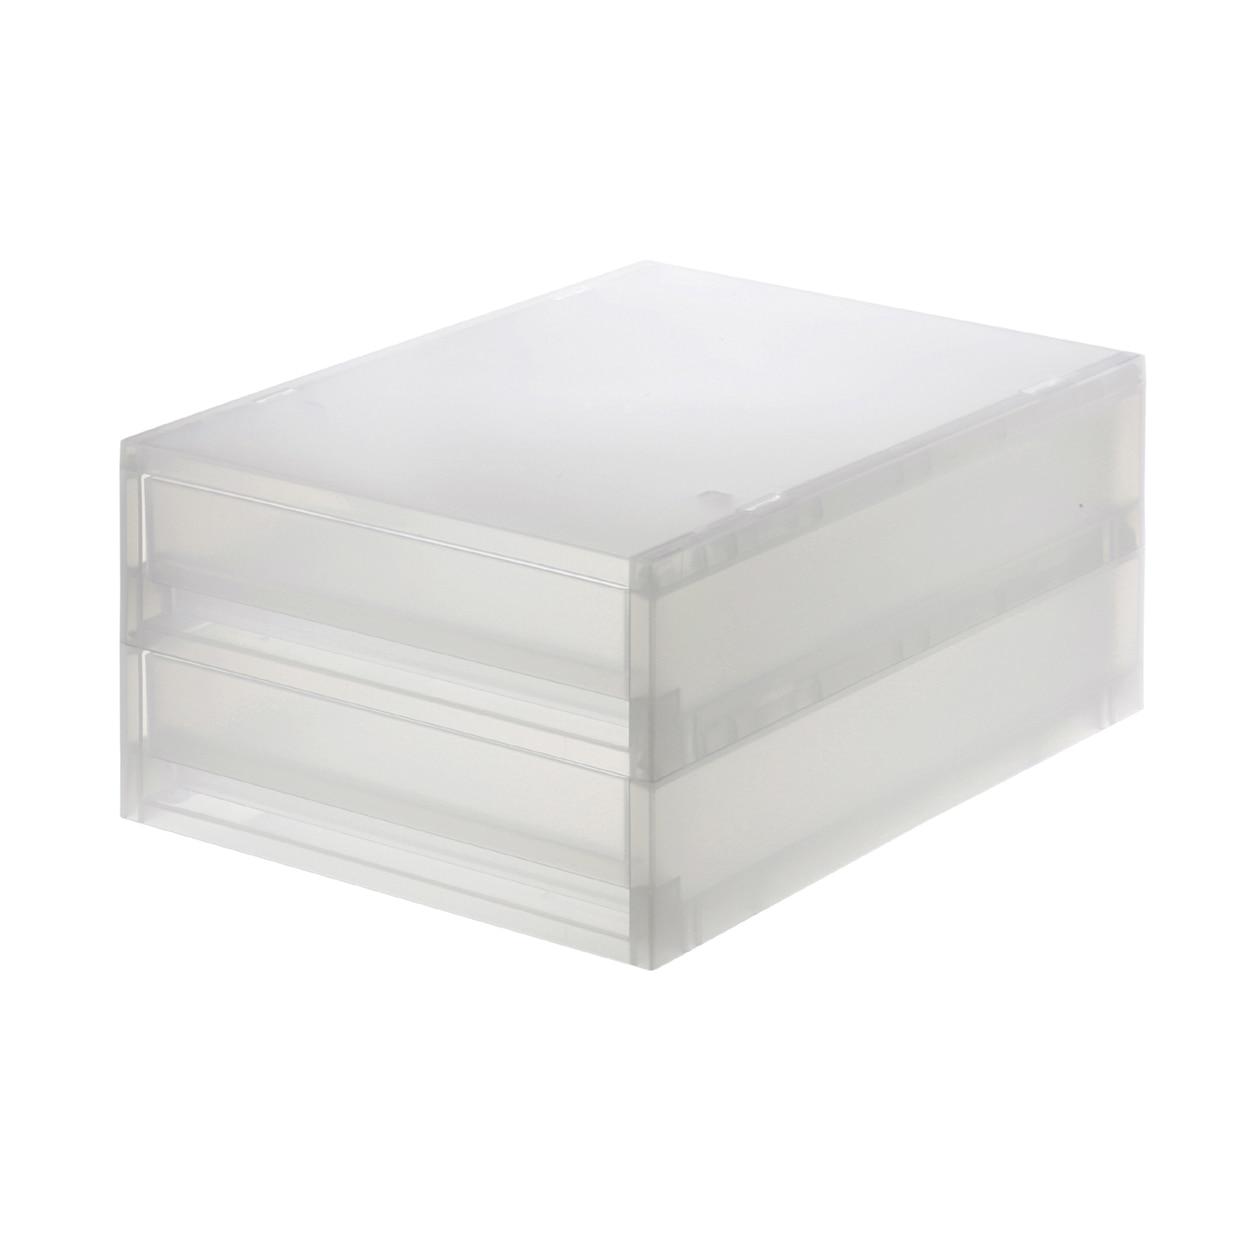 RoomClip商品情報 - PPケース引出式薄型2段・4個組【まとめ買い】